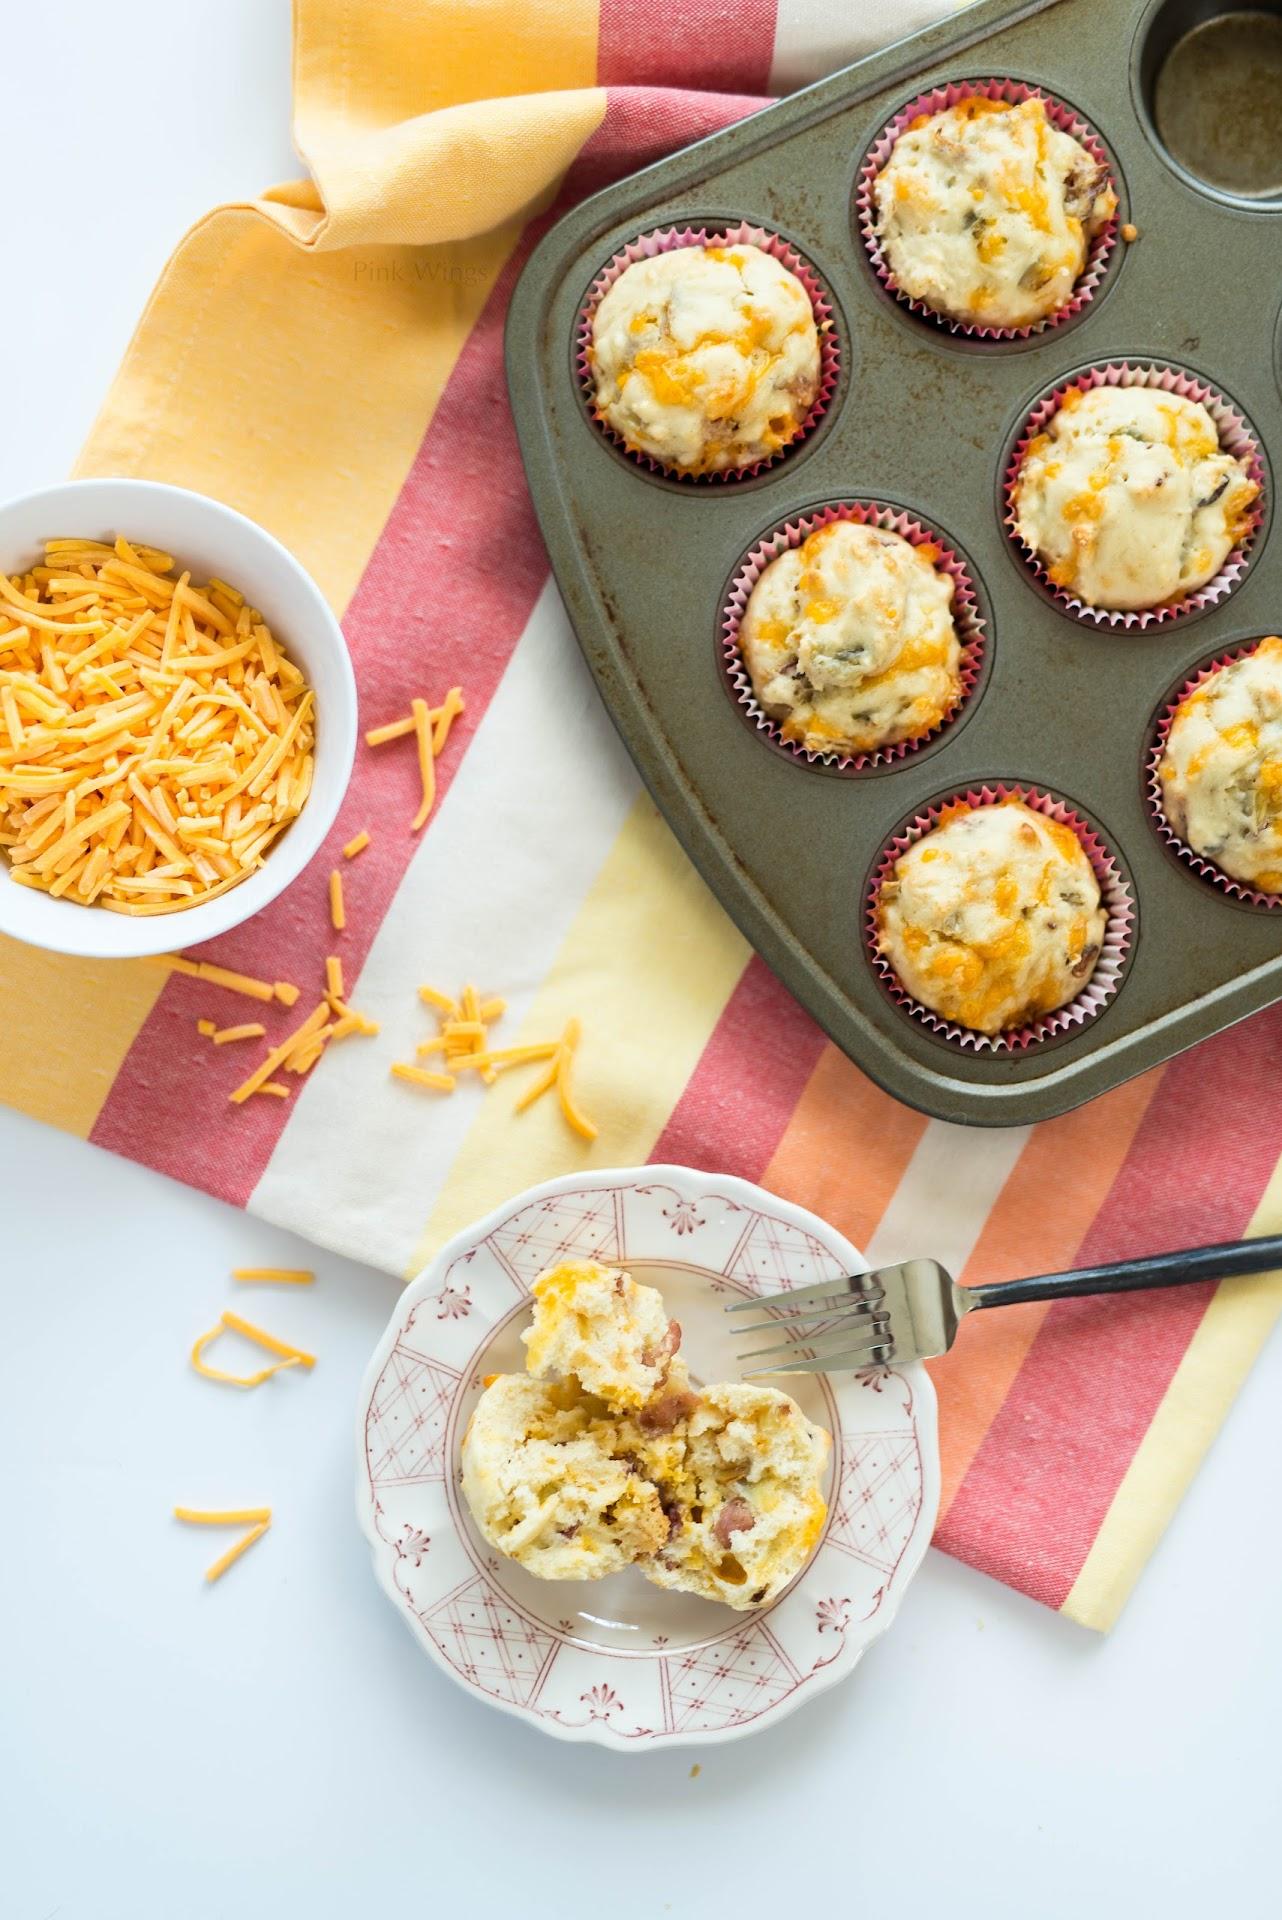 savory muffin recipe, road trip snacks, man muffins, breakfast food,